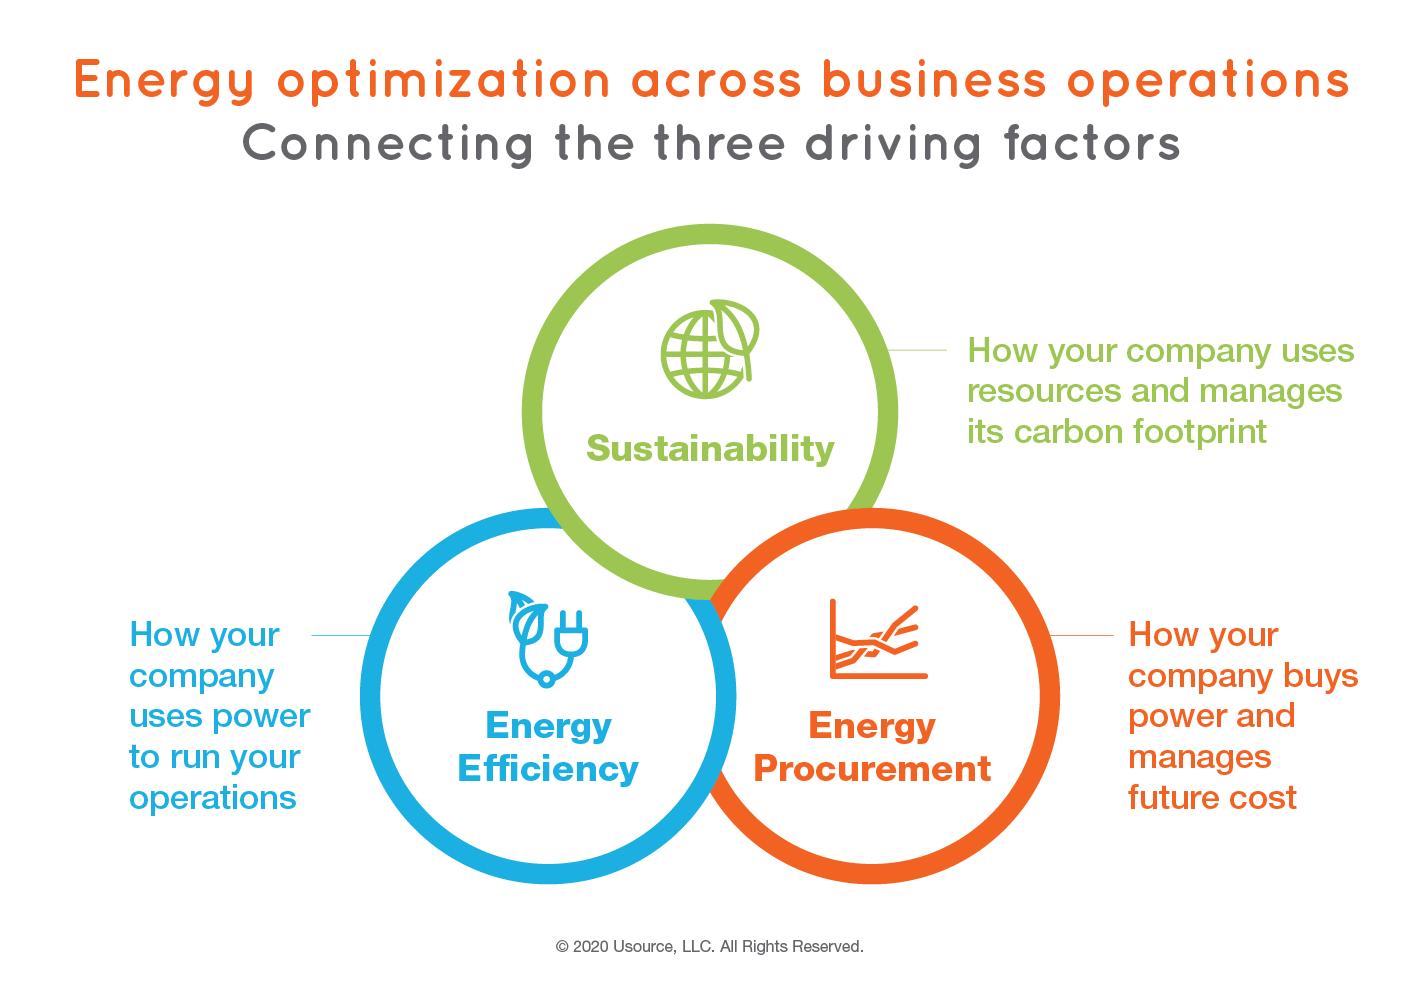 Usource Commercial Energy Optimization